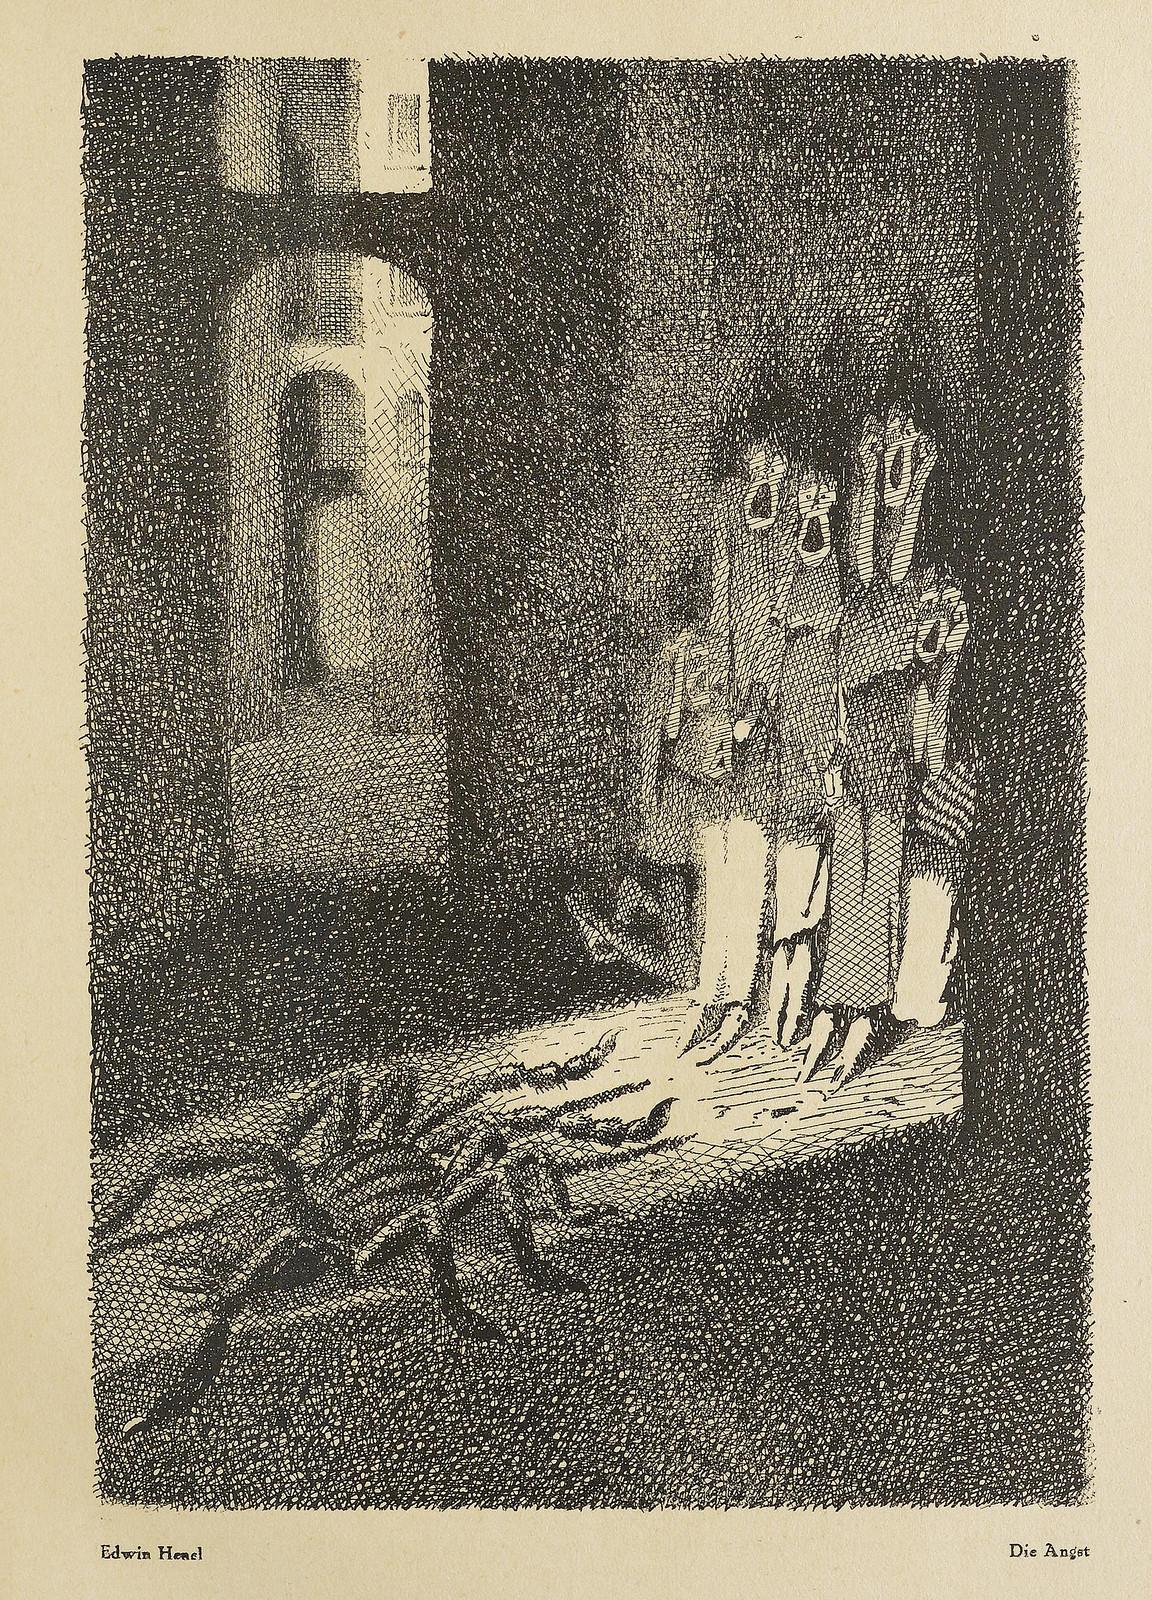 Der Orchideengarten - January 1919 - Edwin Henel - Die Angst